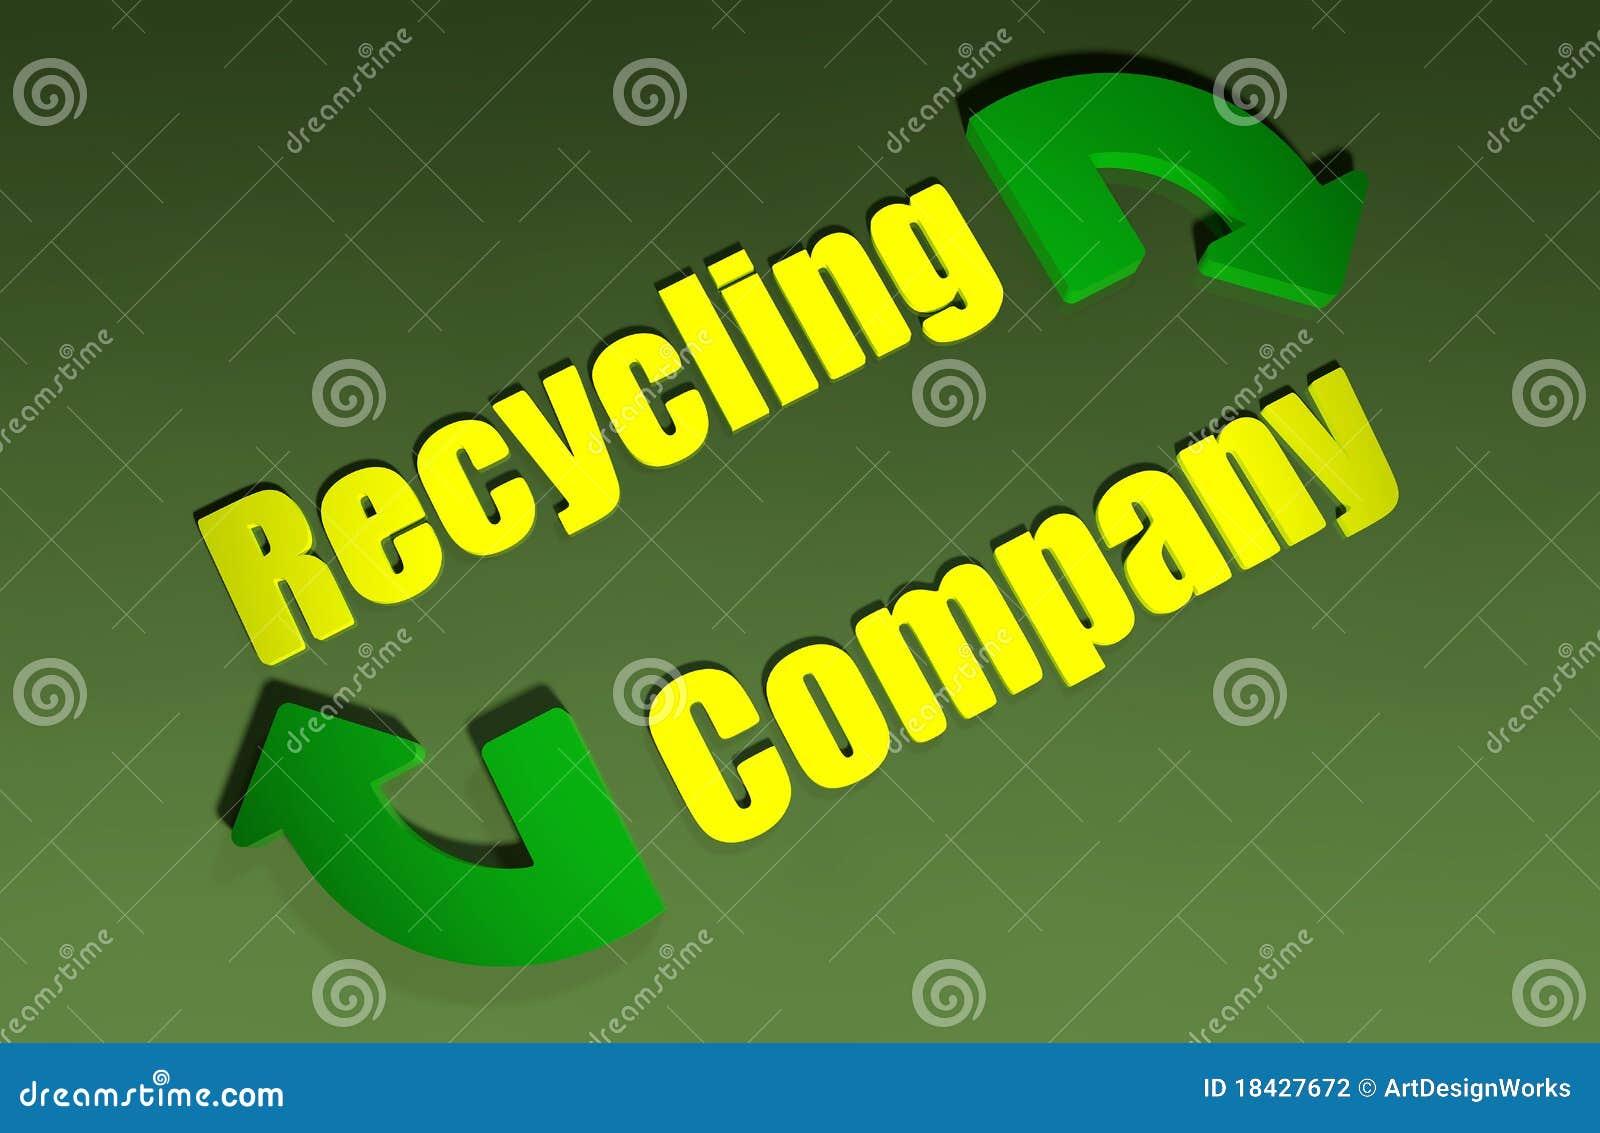 Recycling company design